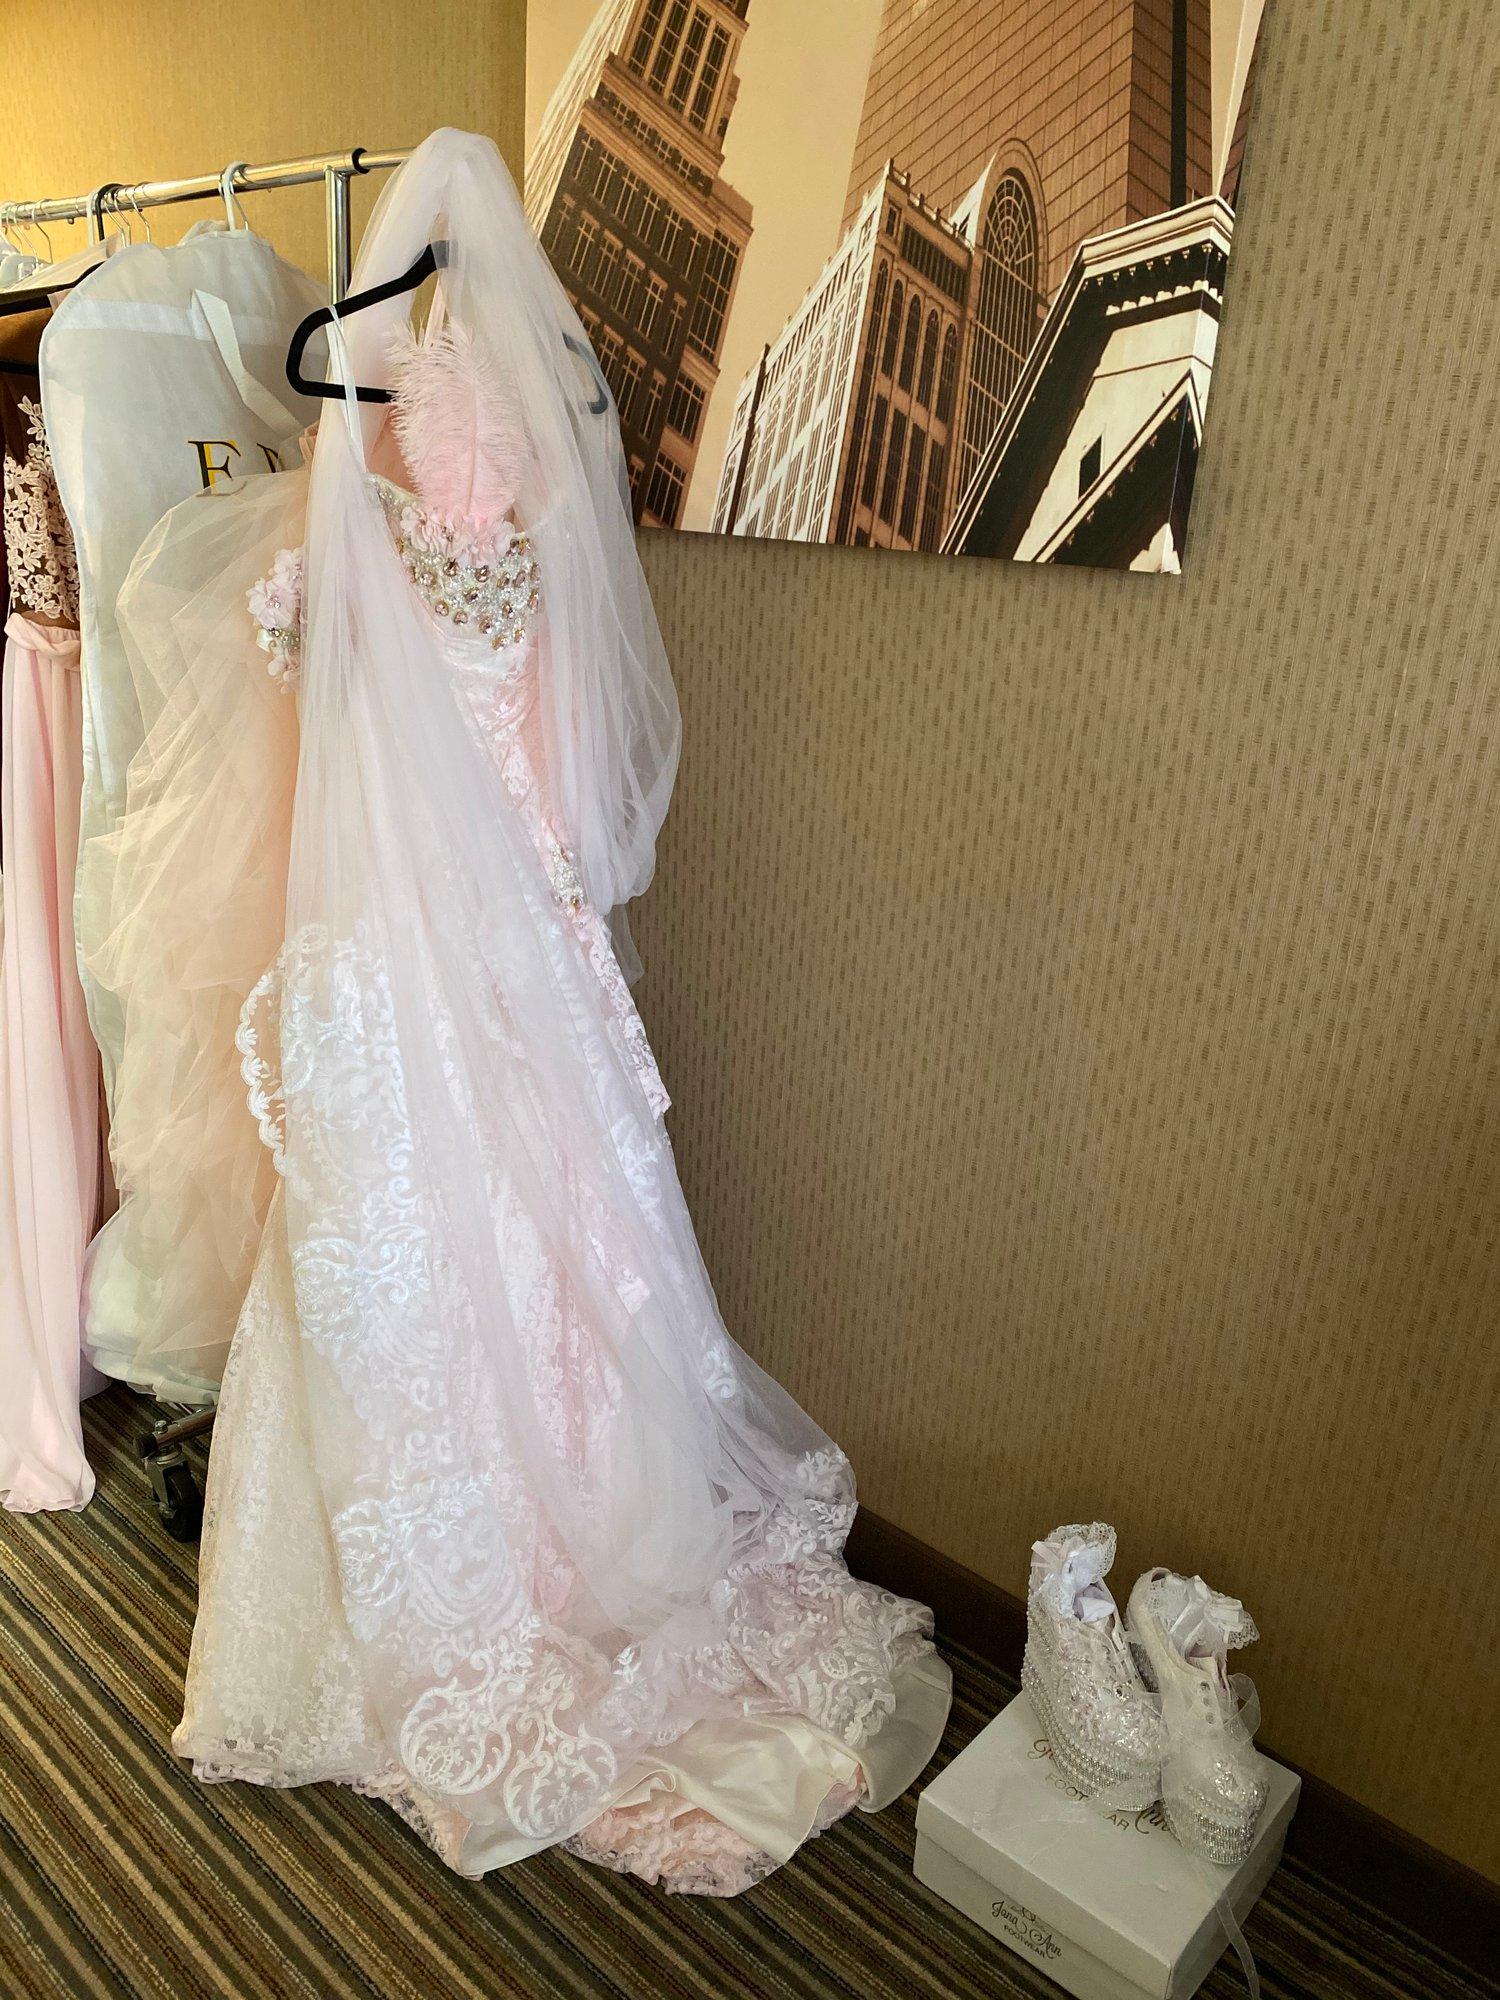 Image of Pink blushing bride gown